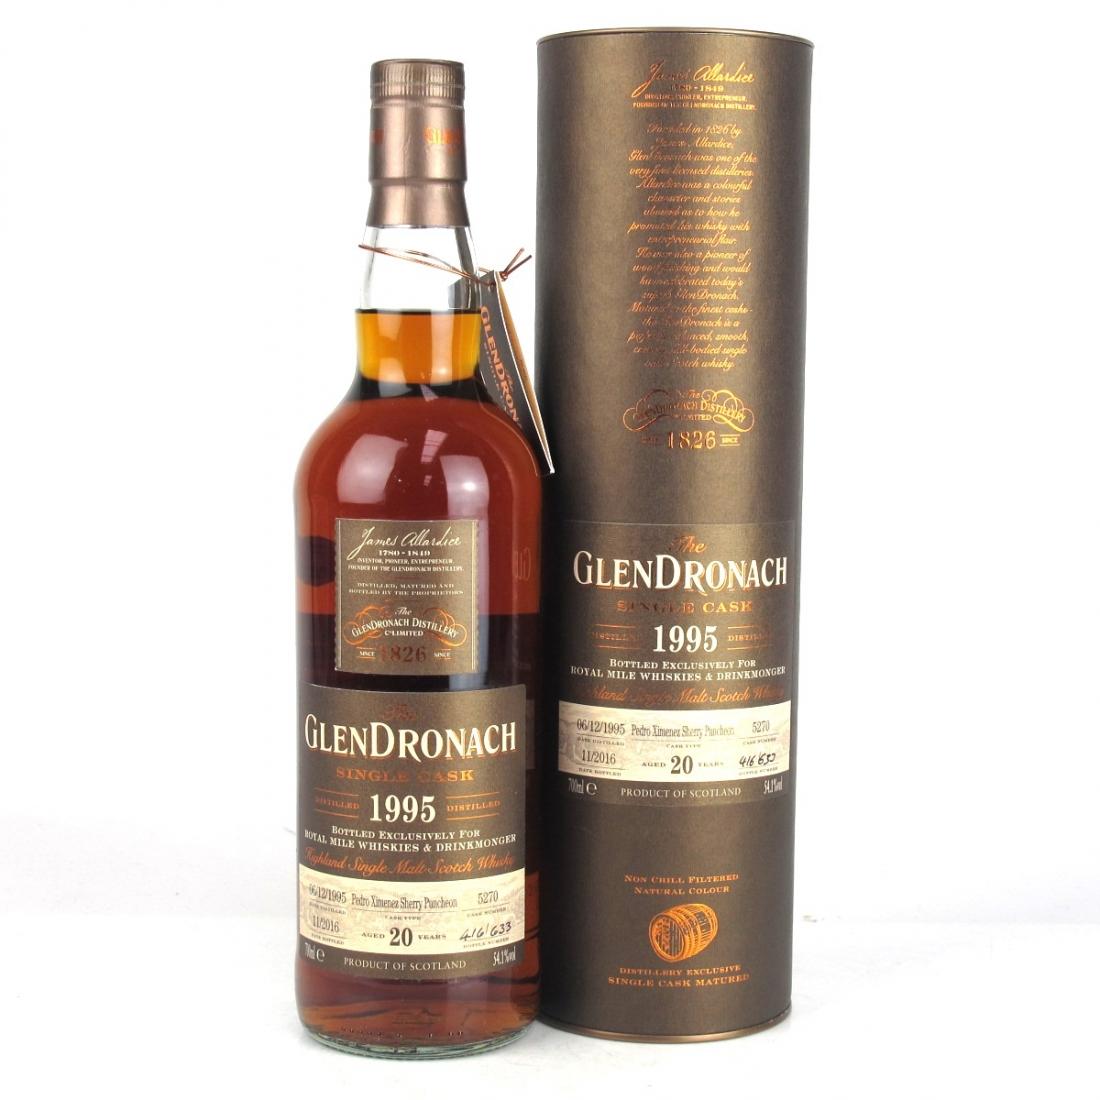 Glendronach 1995 Single Cask 20 Year Old #5270